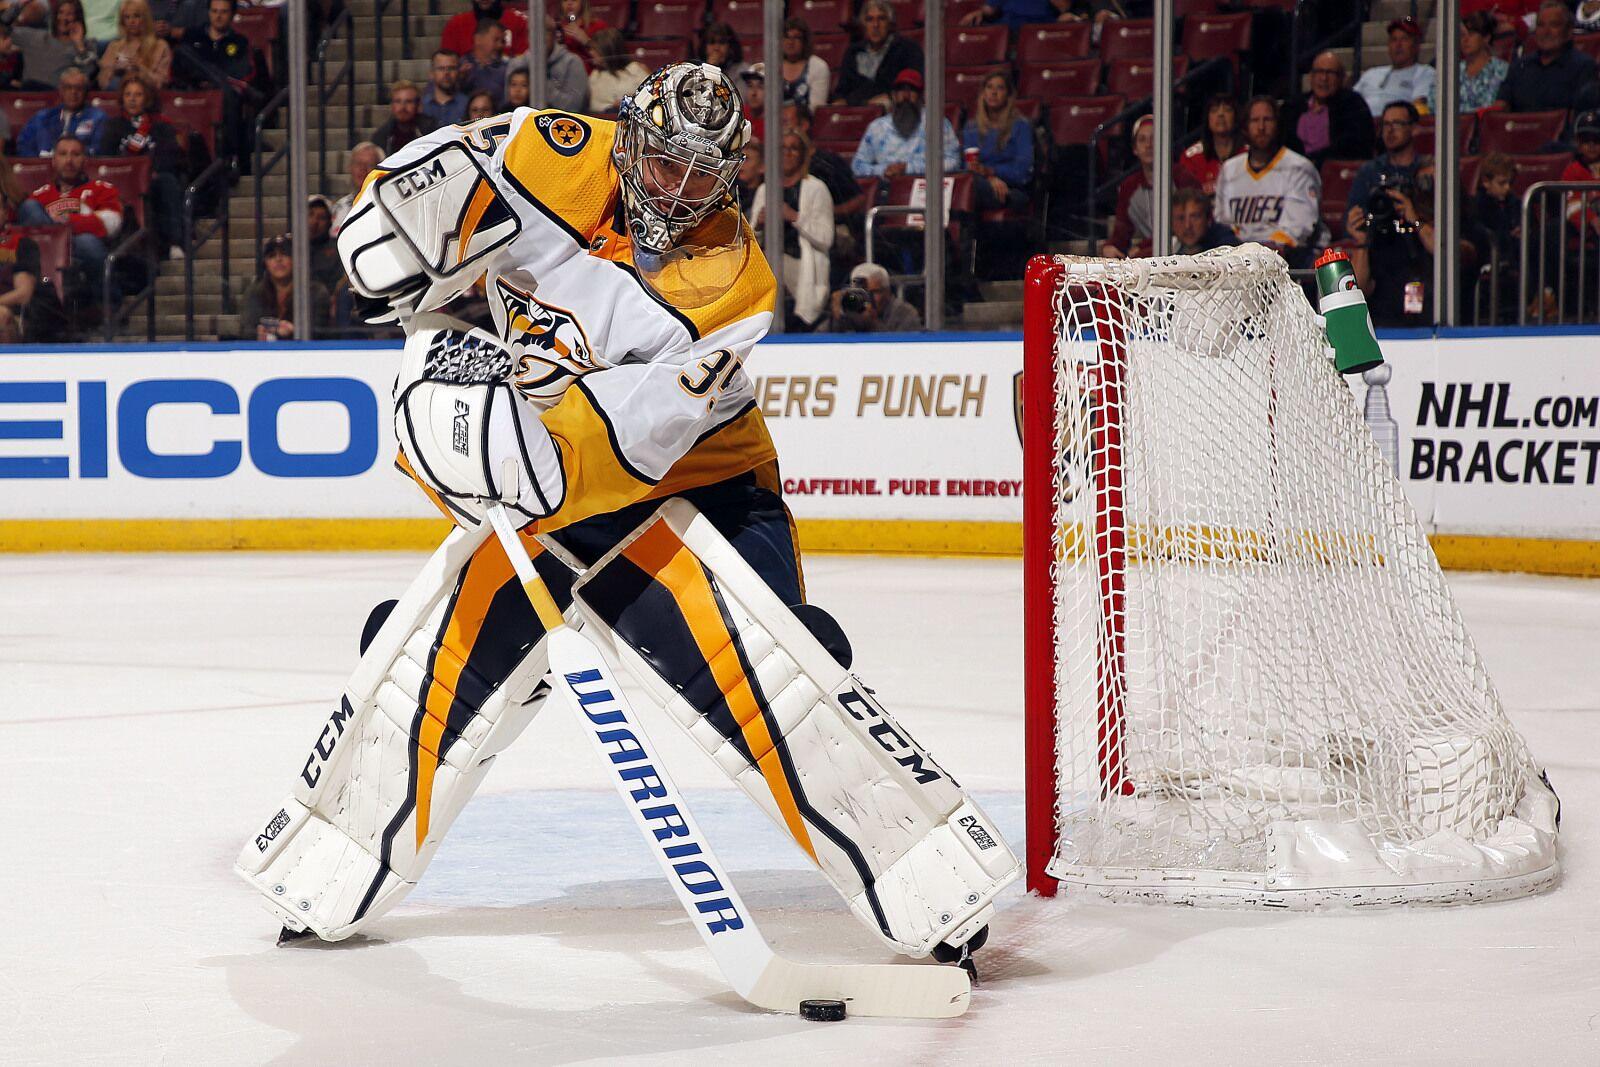 78e35c7a6 Nashville Predators  Pekka Rinne Snubbed on NHL Top Goalies List